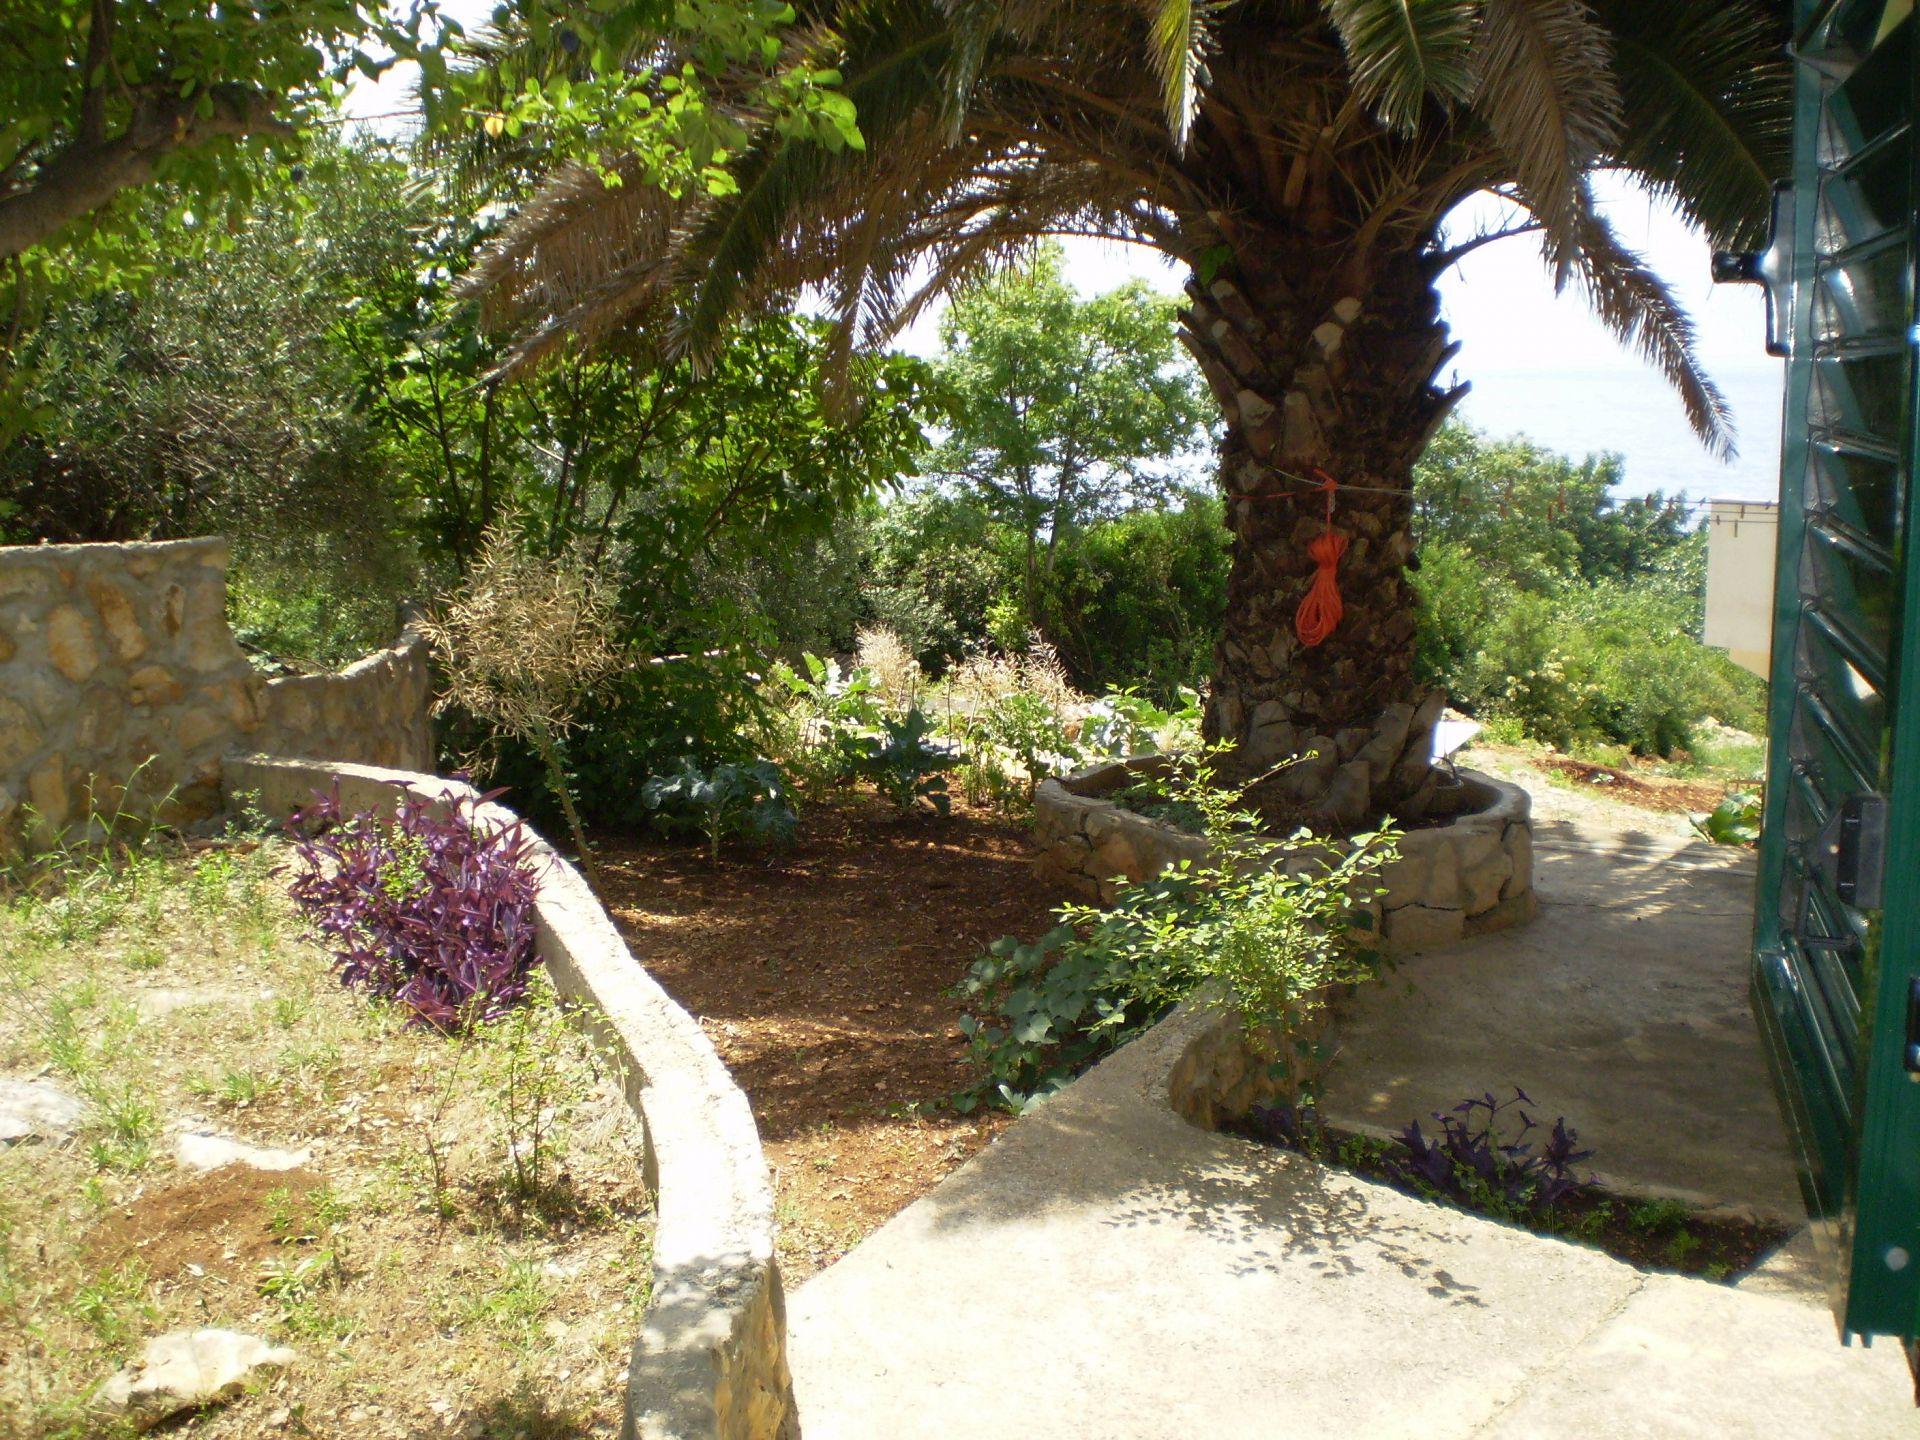 Ferienwohnung Nada A2(8) - Sucuraj (742532), Sucuraj, Insel Hvar, Dalmatien, Kroatien, Bild 5